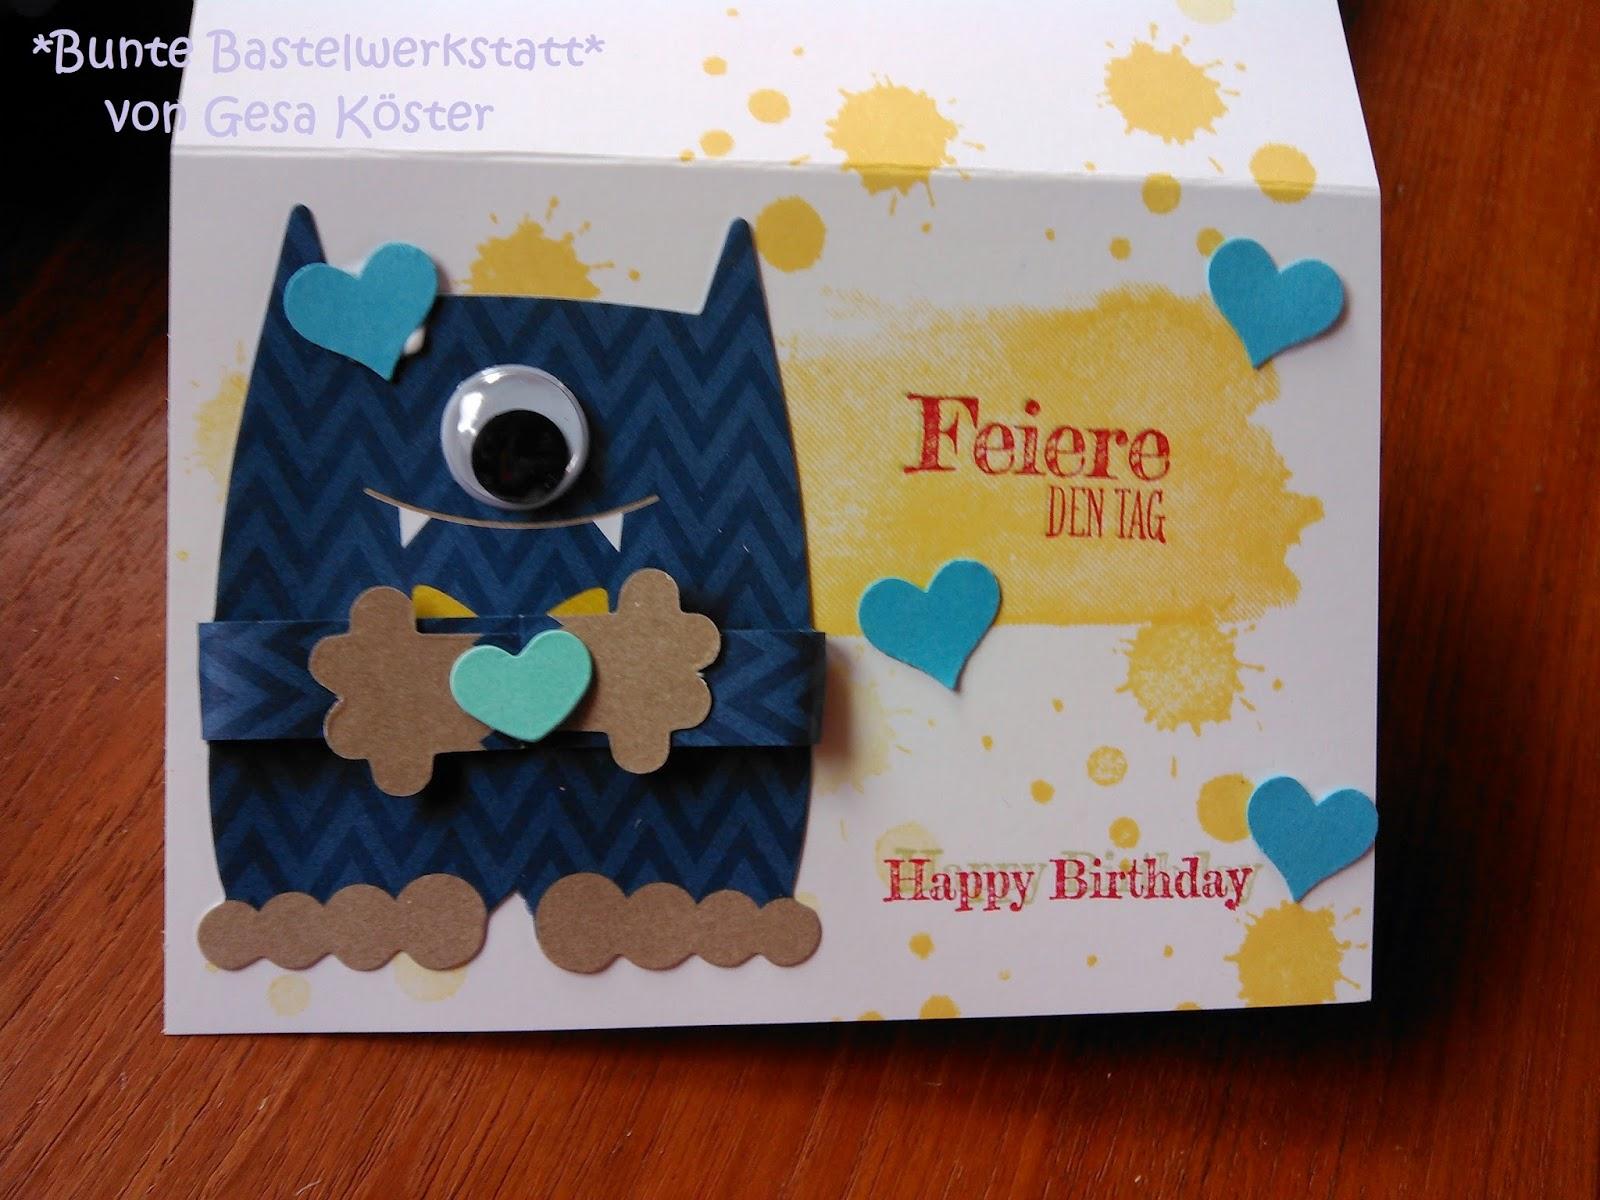 Geburtstagskarten Basteln Fur Jungs.Bunte Bastelwerkstatt Jungen Geburtstagskarte